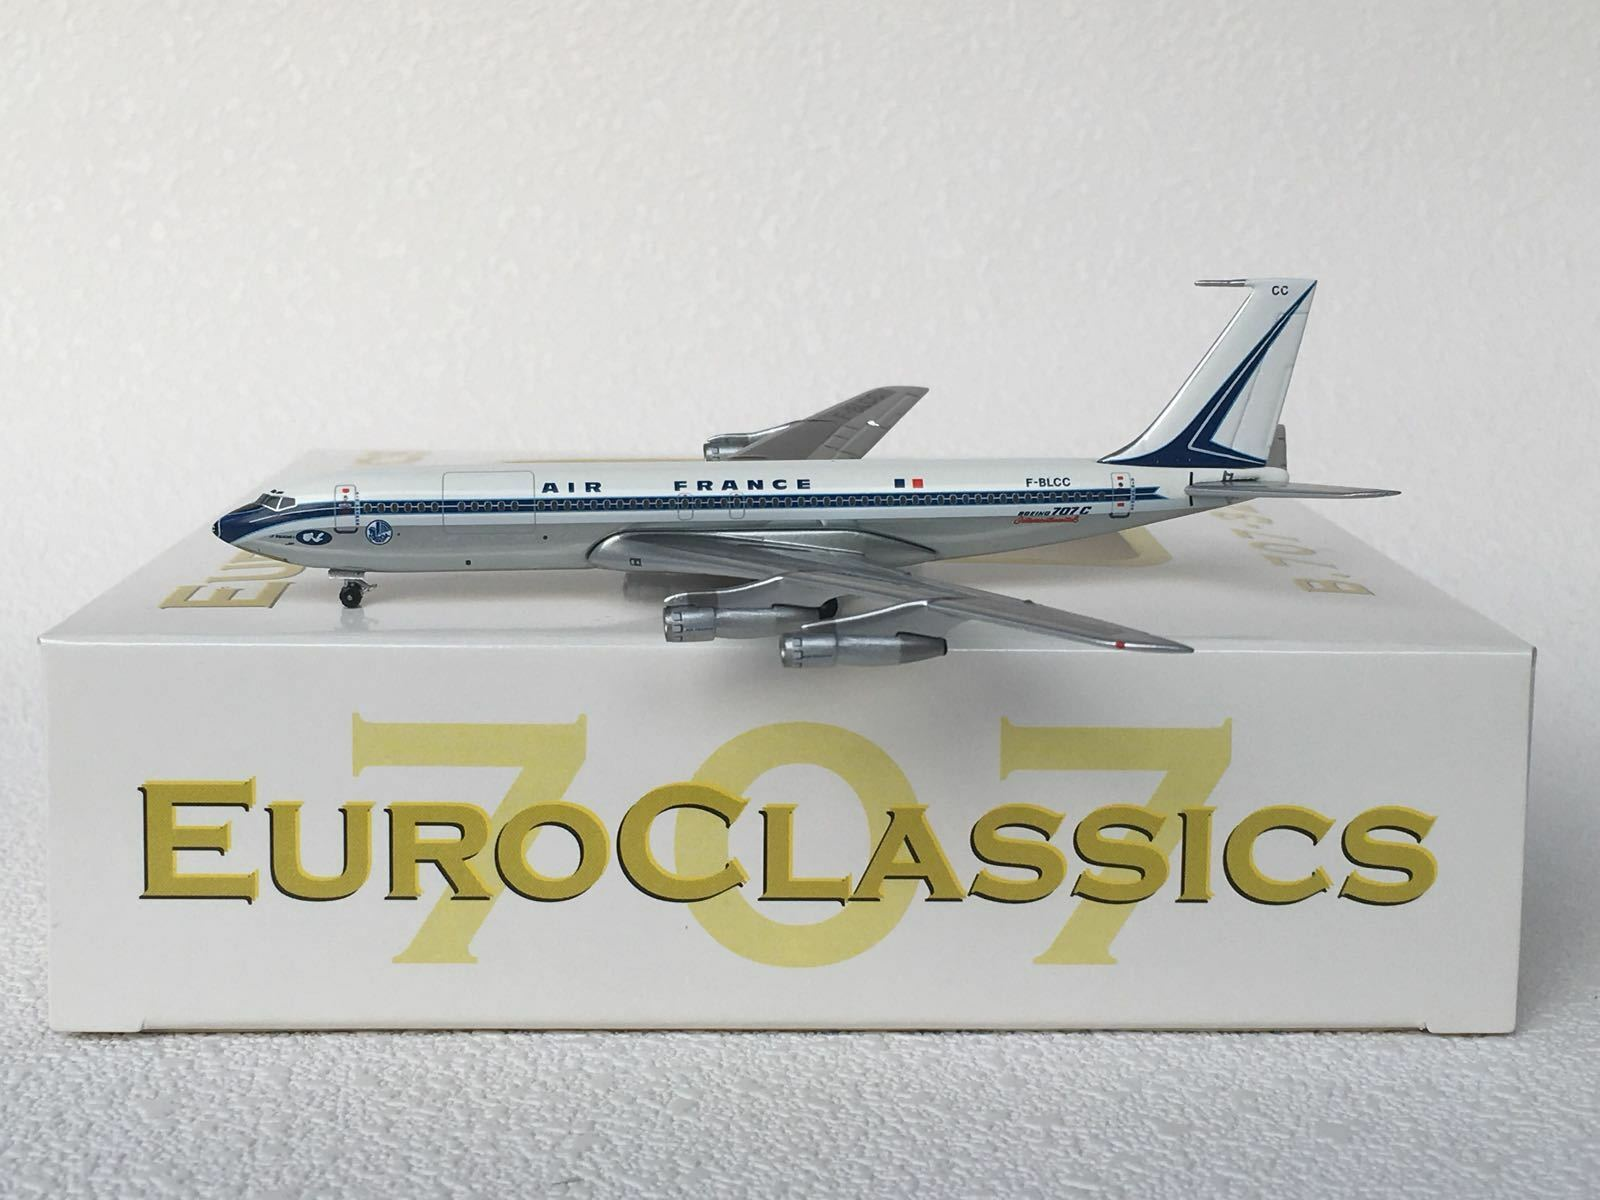 la calidad primero los consumidores primero Aeroclassics 1 400 Air France France France Boeing B707-320 BC F-blcc  Garantía 100% de ajuste